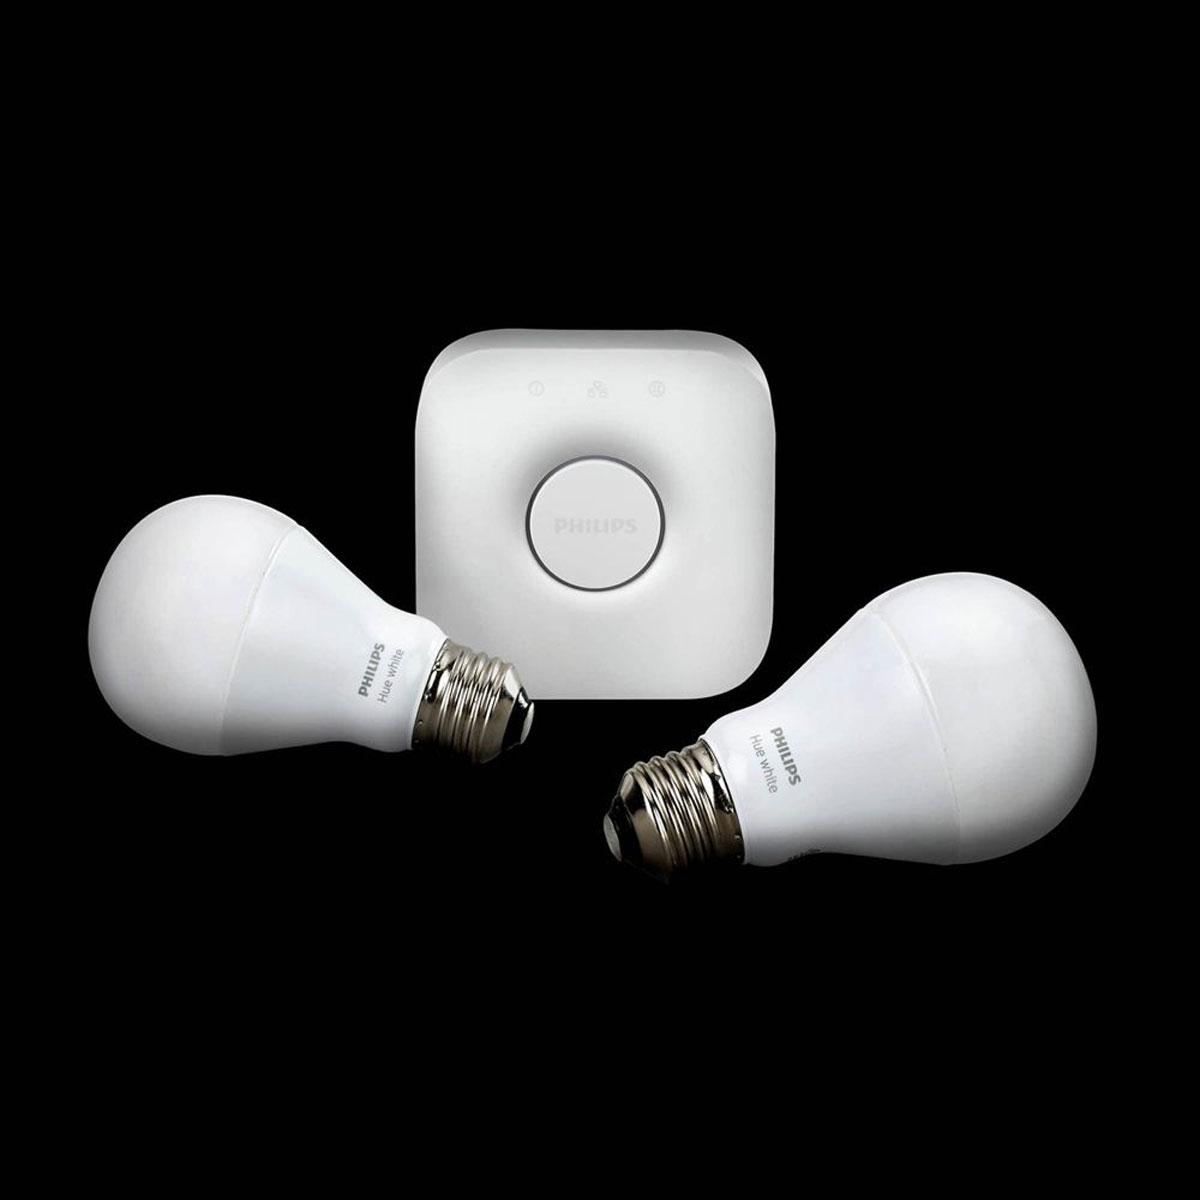 philips hue white starterset e27 a60 2 lampen met bridge 2 0. Black Bedroom Furniture Sets. Home Design Ideas